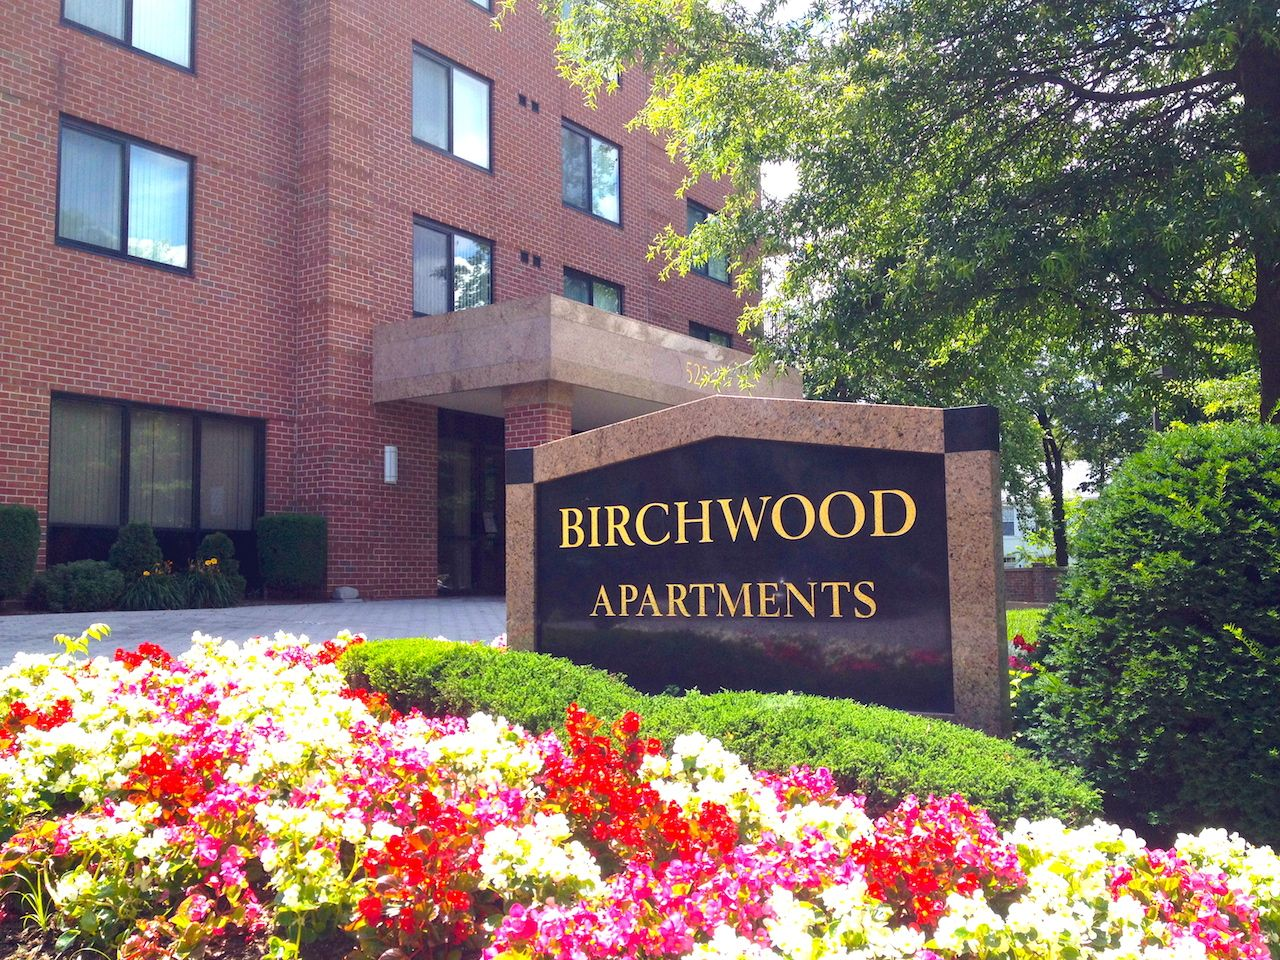 Birchwood 545 North Pollard Street Arlington Va 22203 Phone 703 465 0050 Facsimile 703 465 7812 Birch Virginia Apartments Birchwood Luxury Apartments